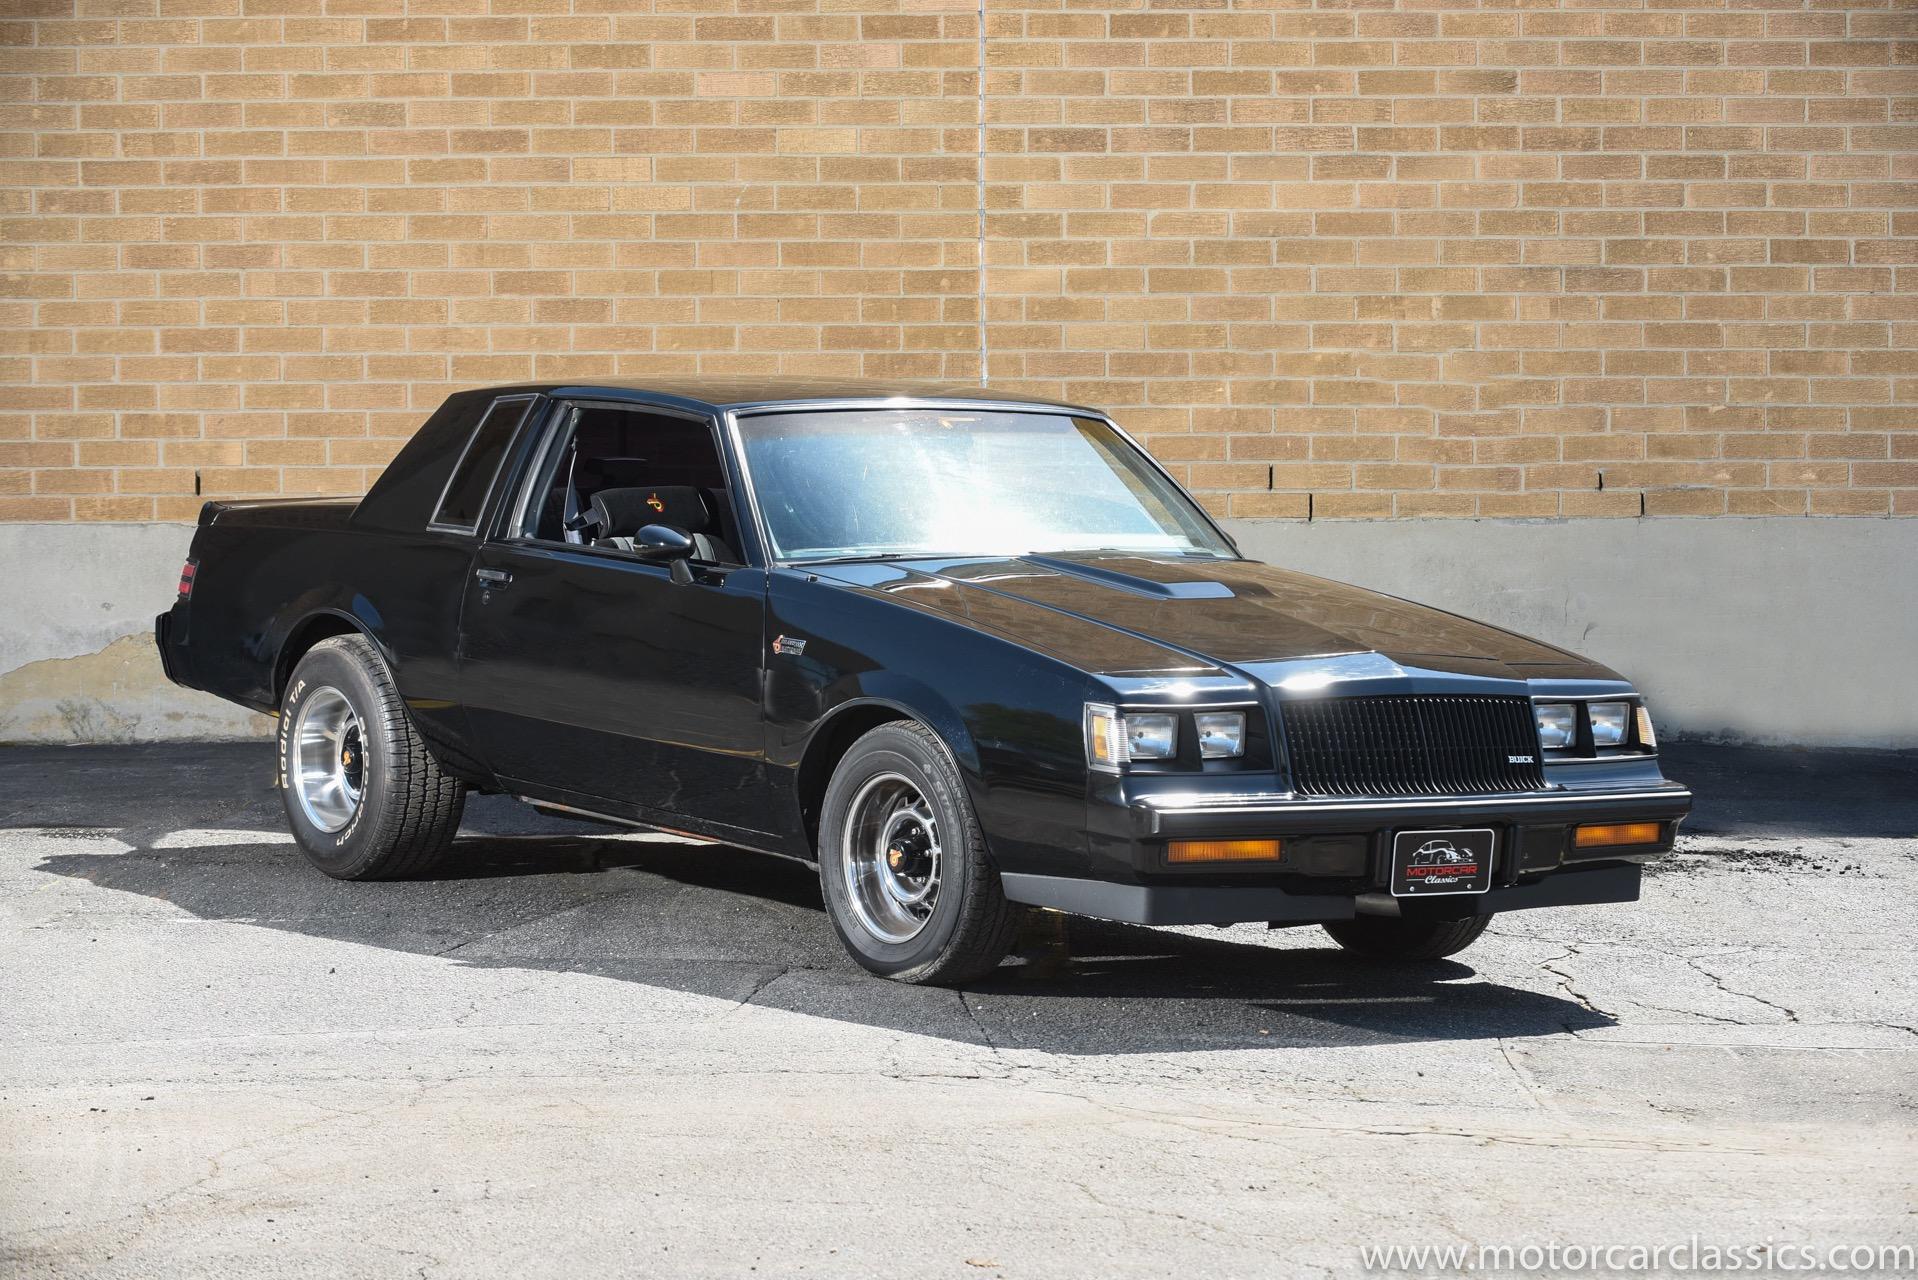 1987 Buick Regal Grand National Turbo